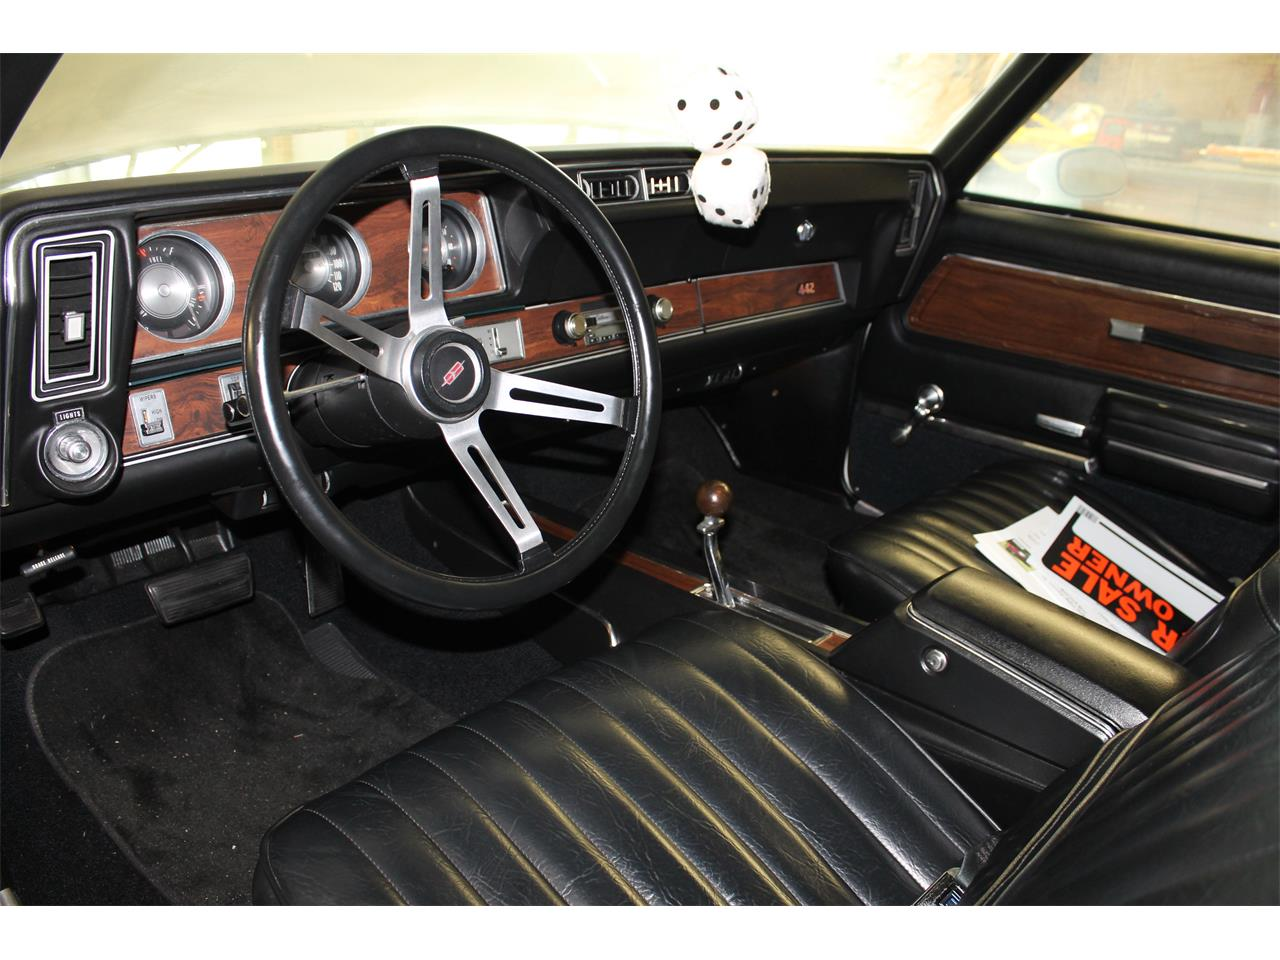 Large Picture of 1972 Cutlass Supreme located in Dimondale Michigan - $49,500.00 - MXYX